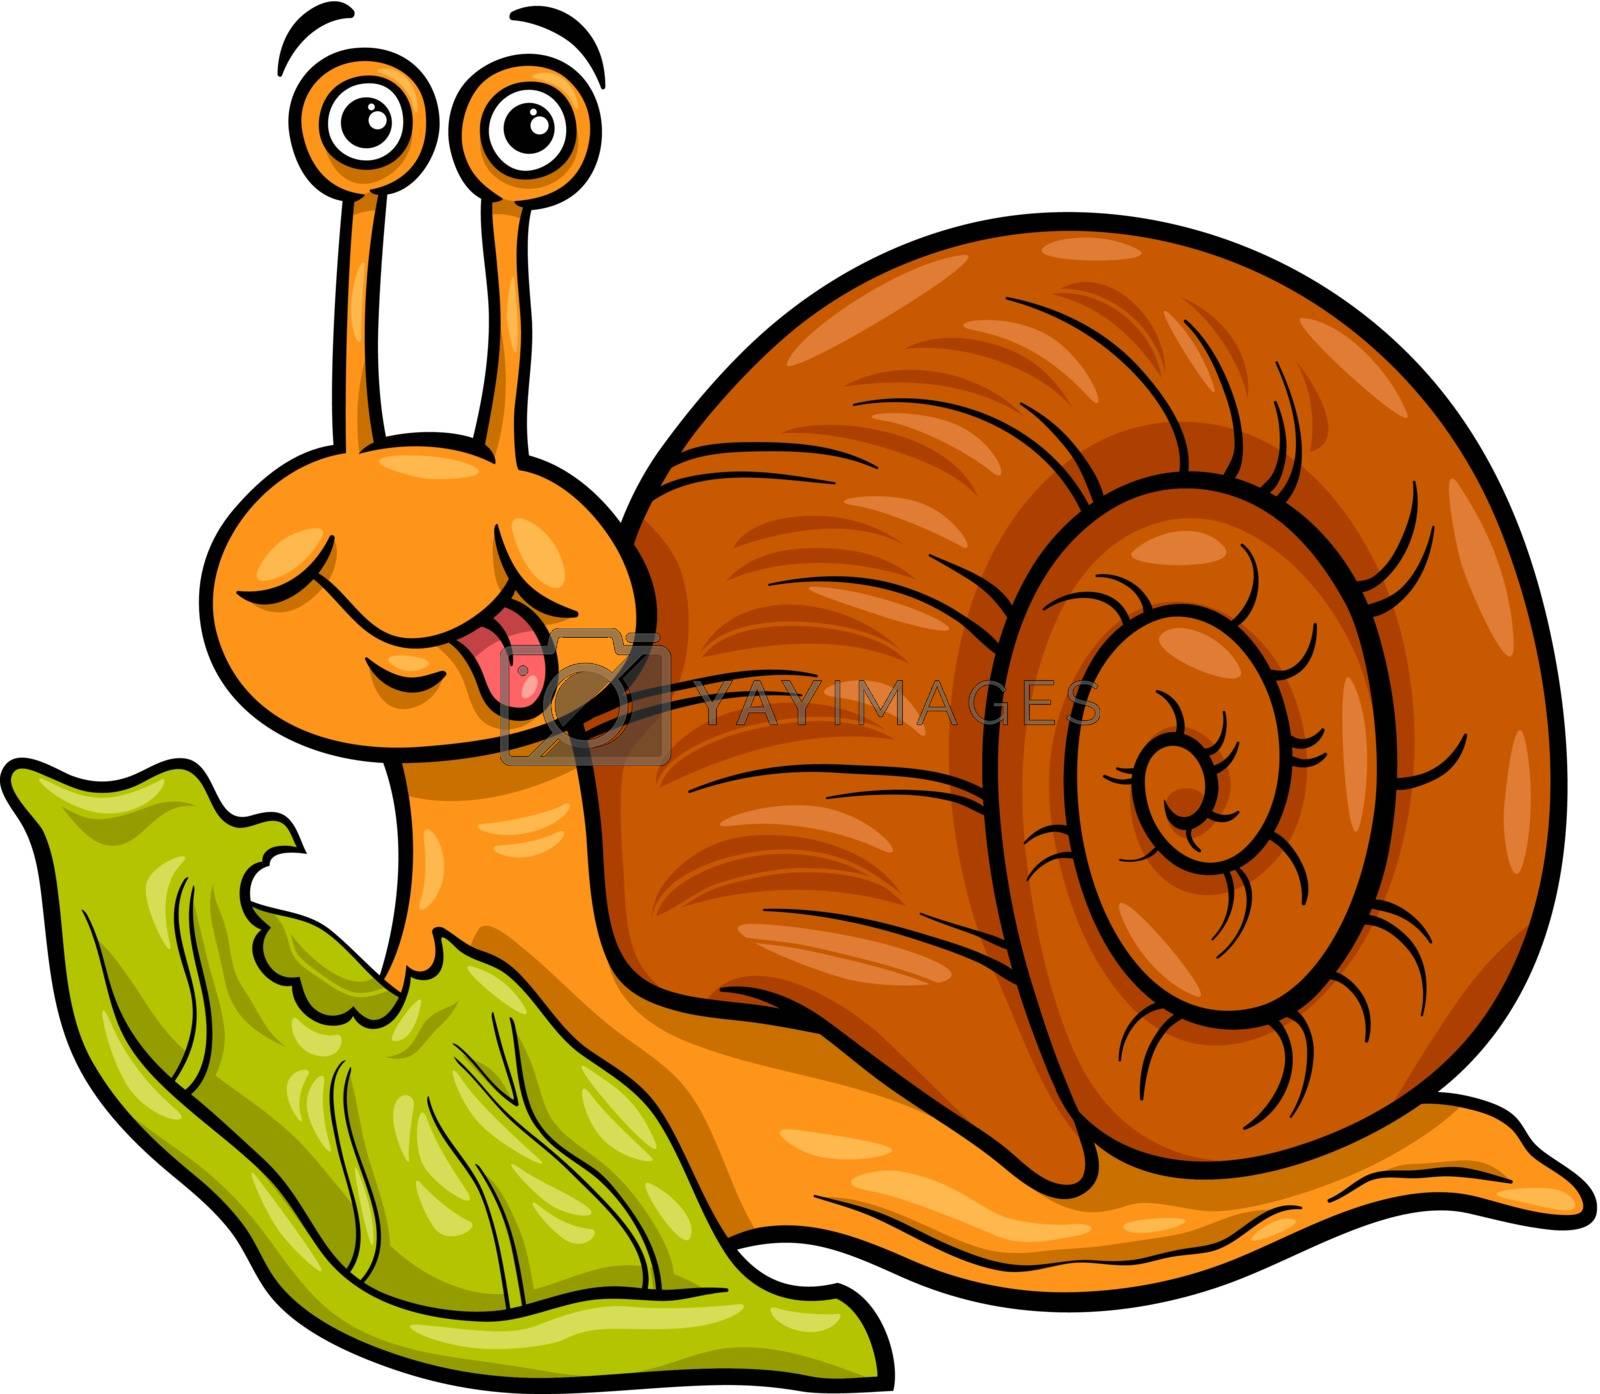 Royalty free image of snail and lettuce cartoon illustration by izakowski